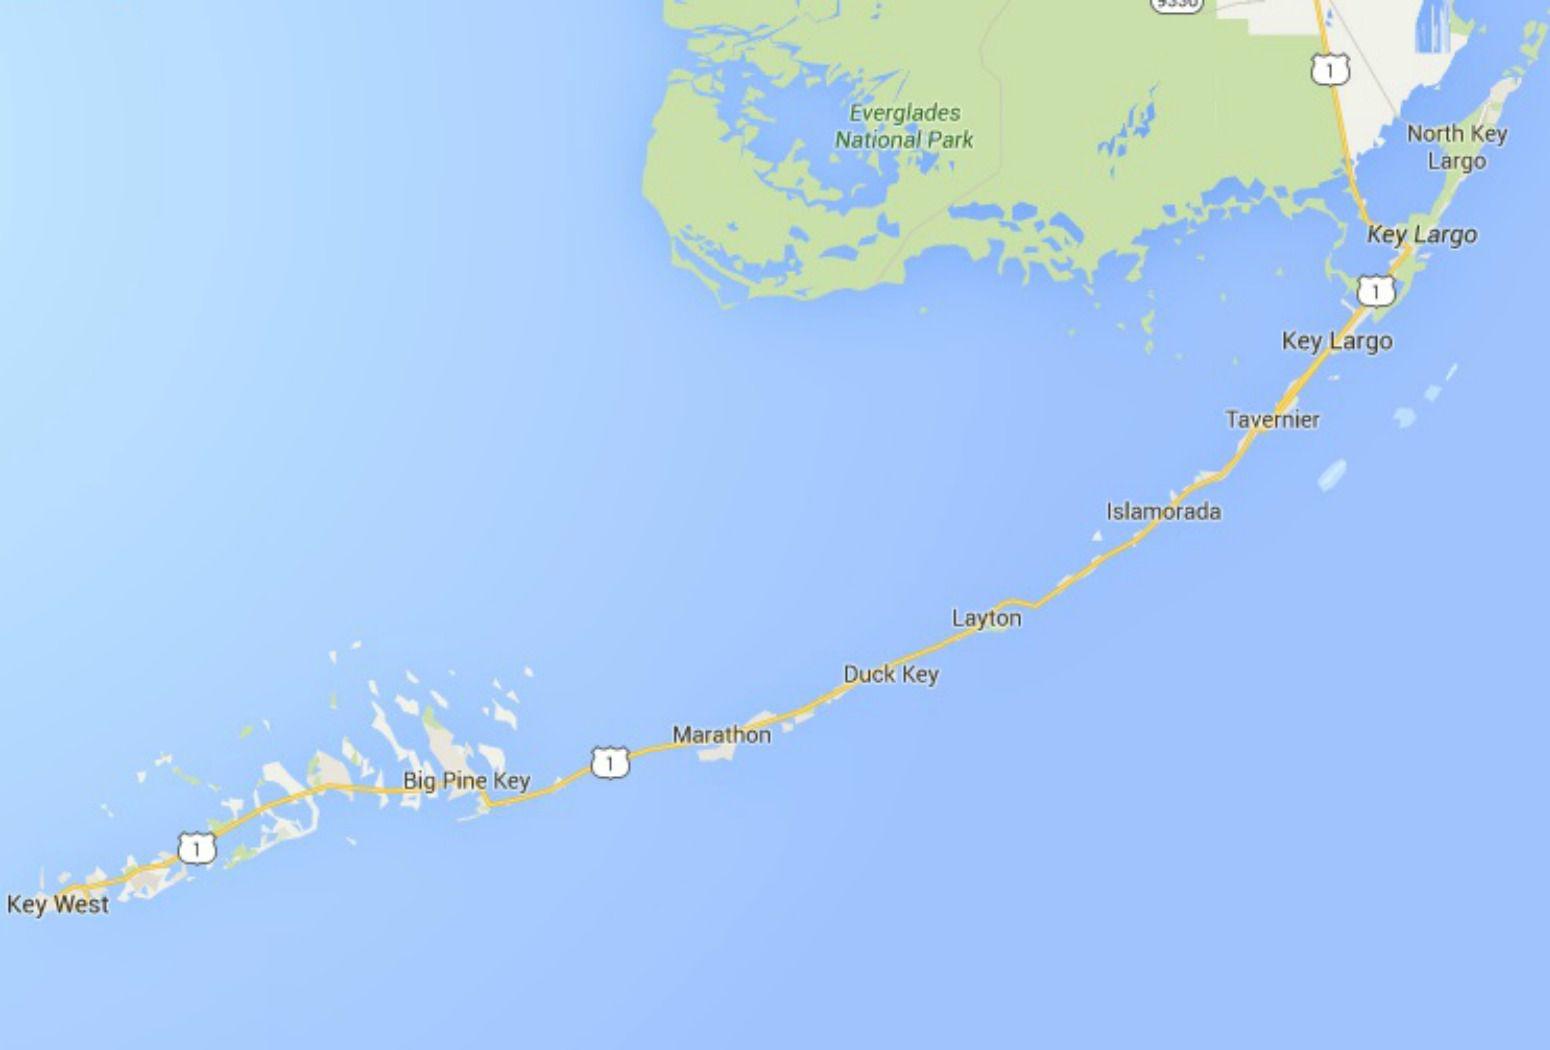 Map Of Florida And Florida Keys.Maps Of Florida Orlando Tampa Miami Keys And More